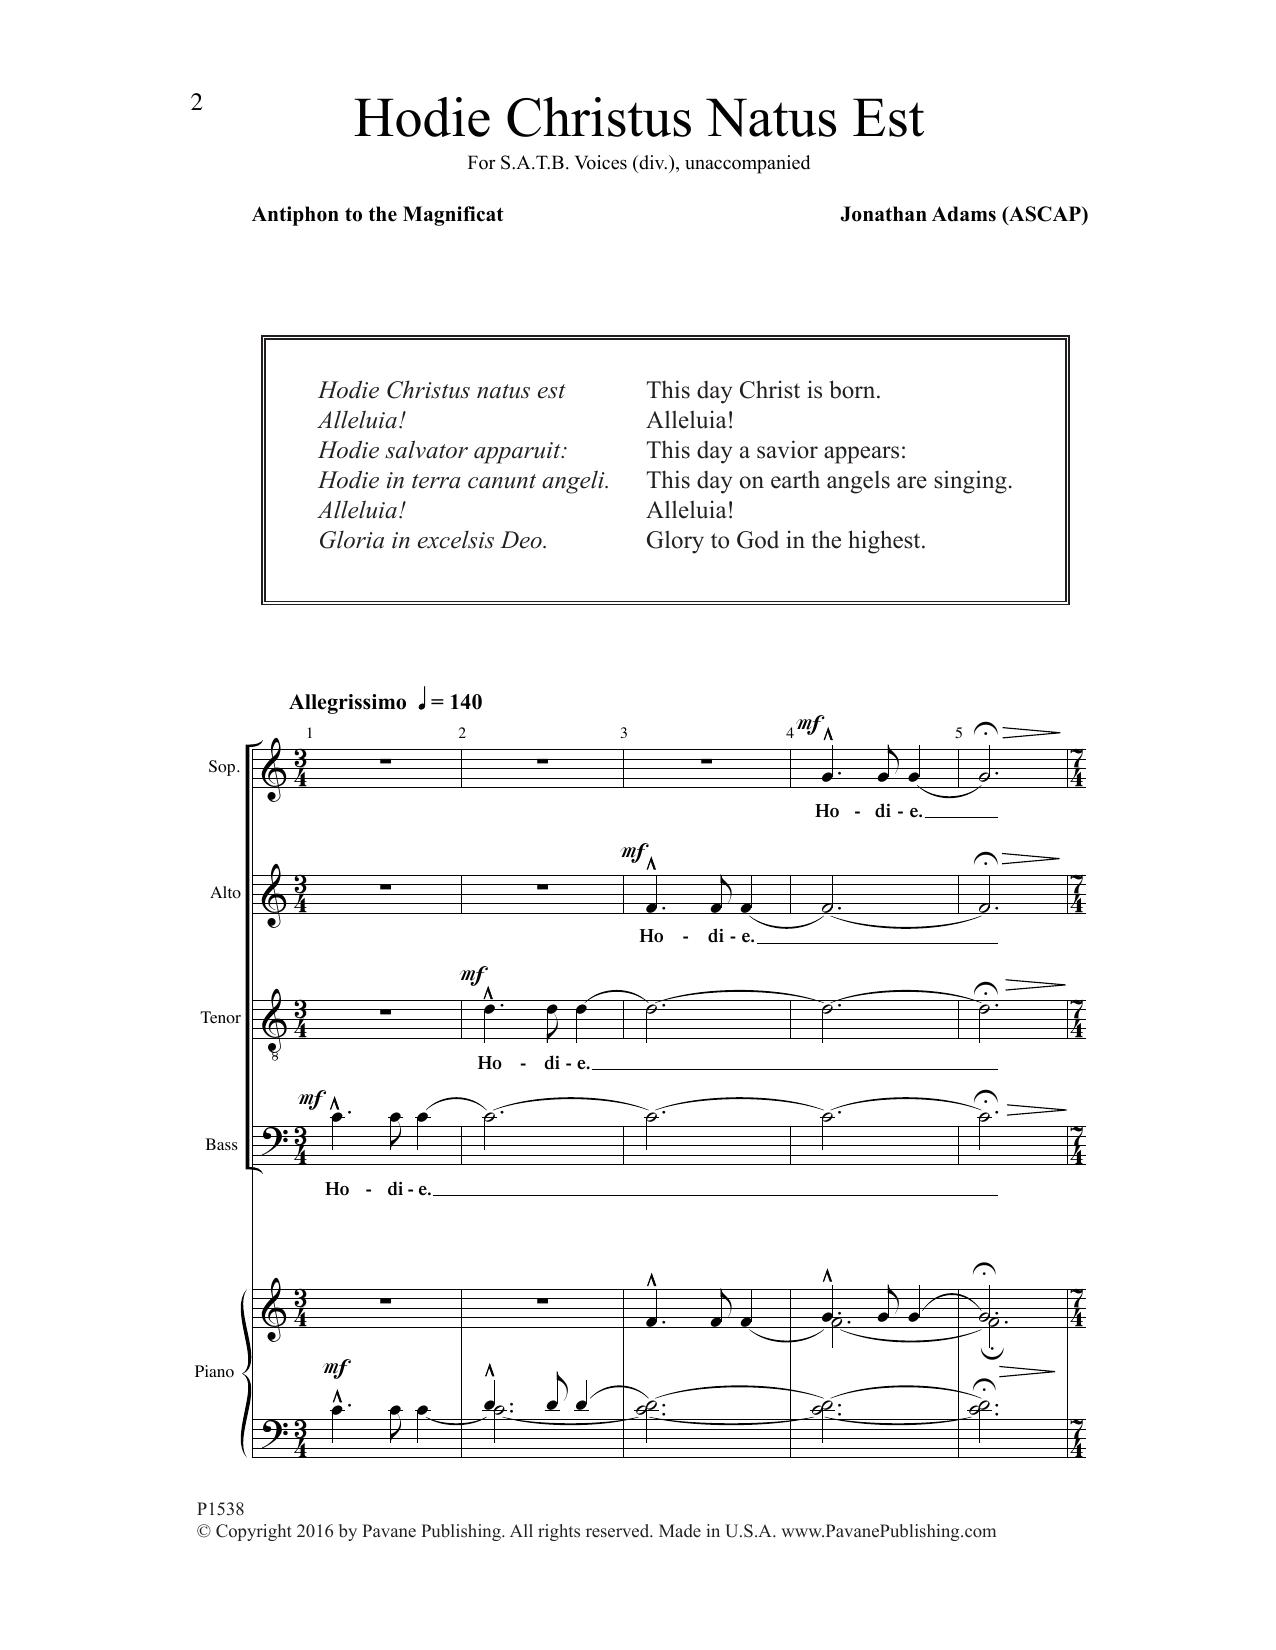 Hodie Christus natus est Sheet Music